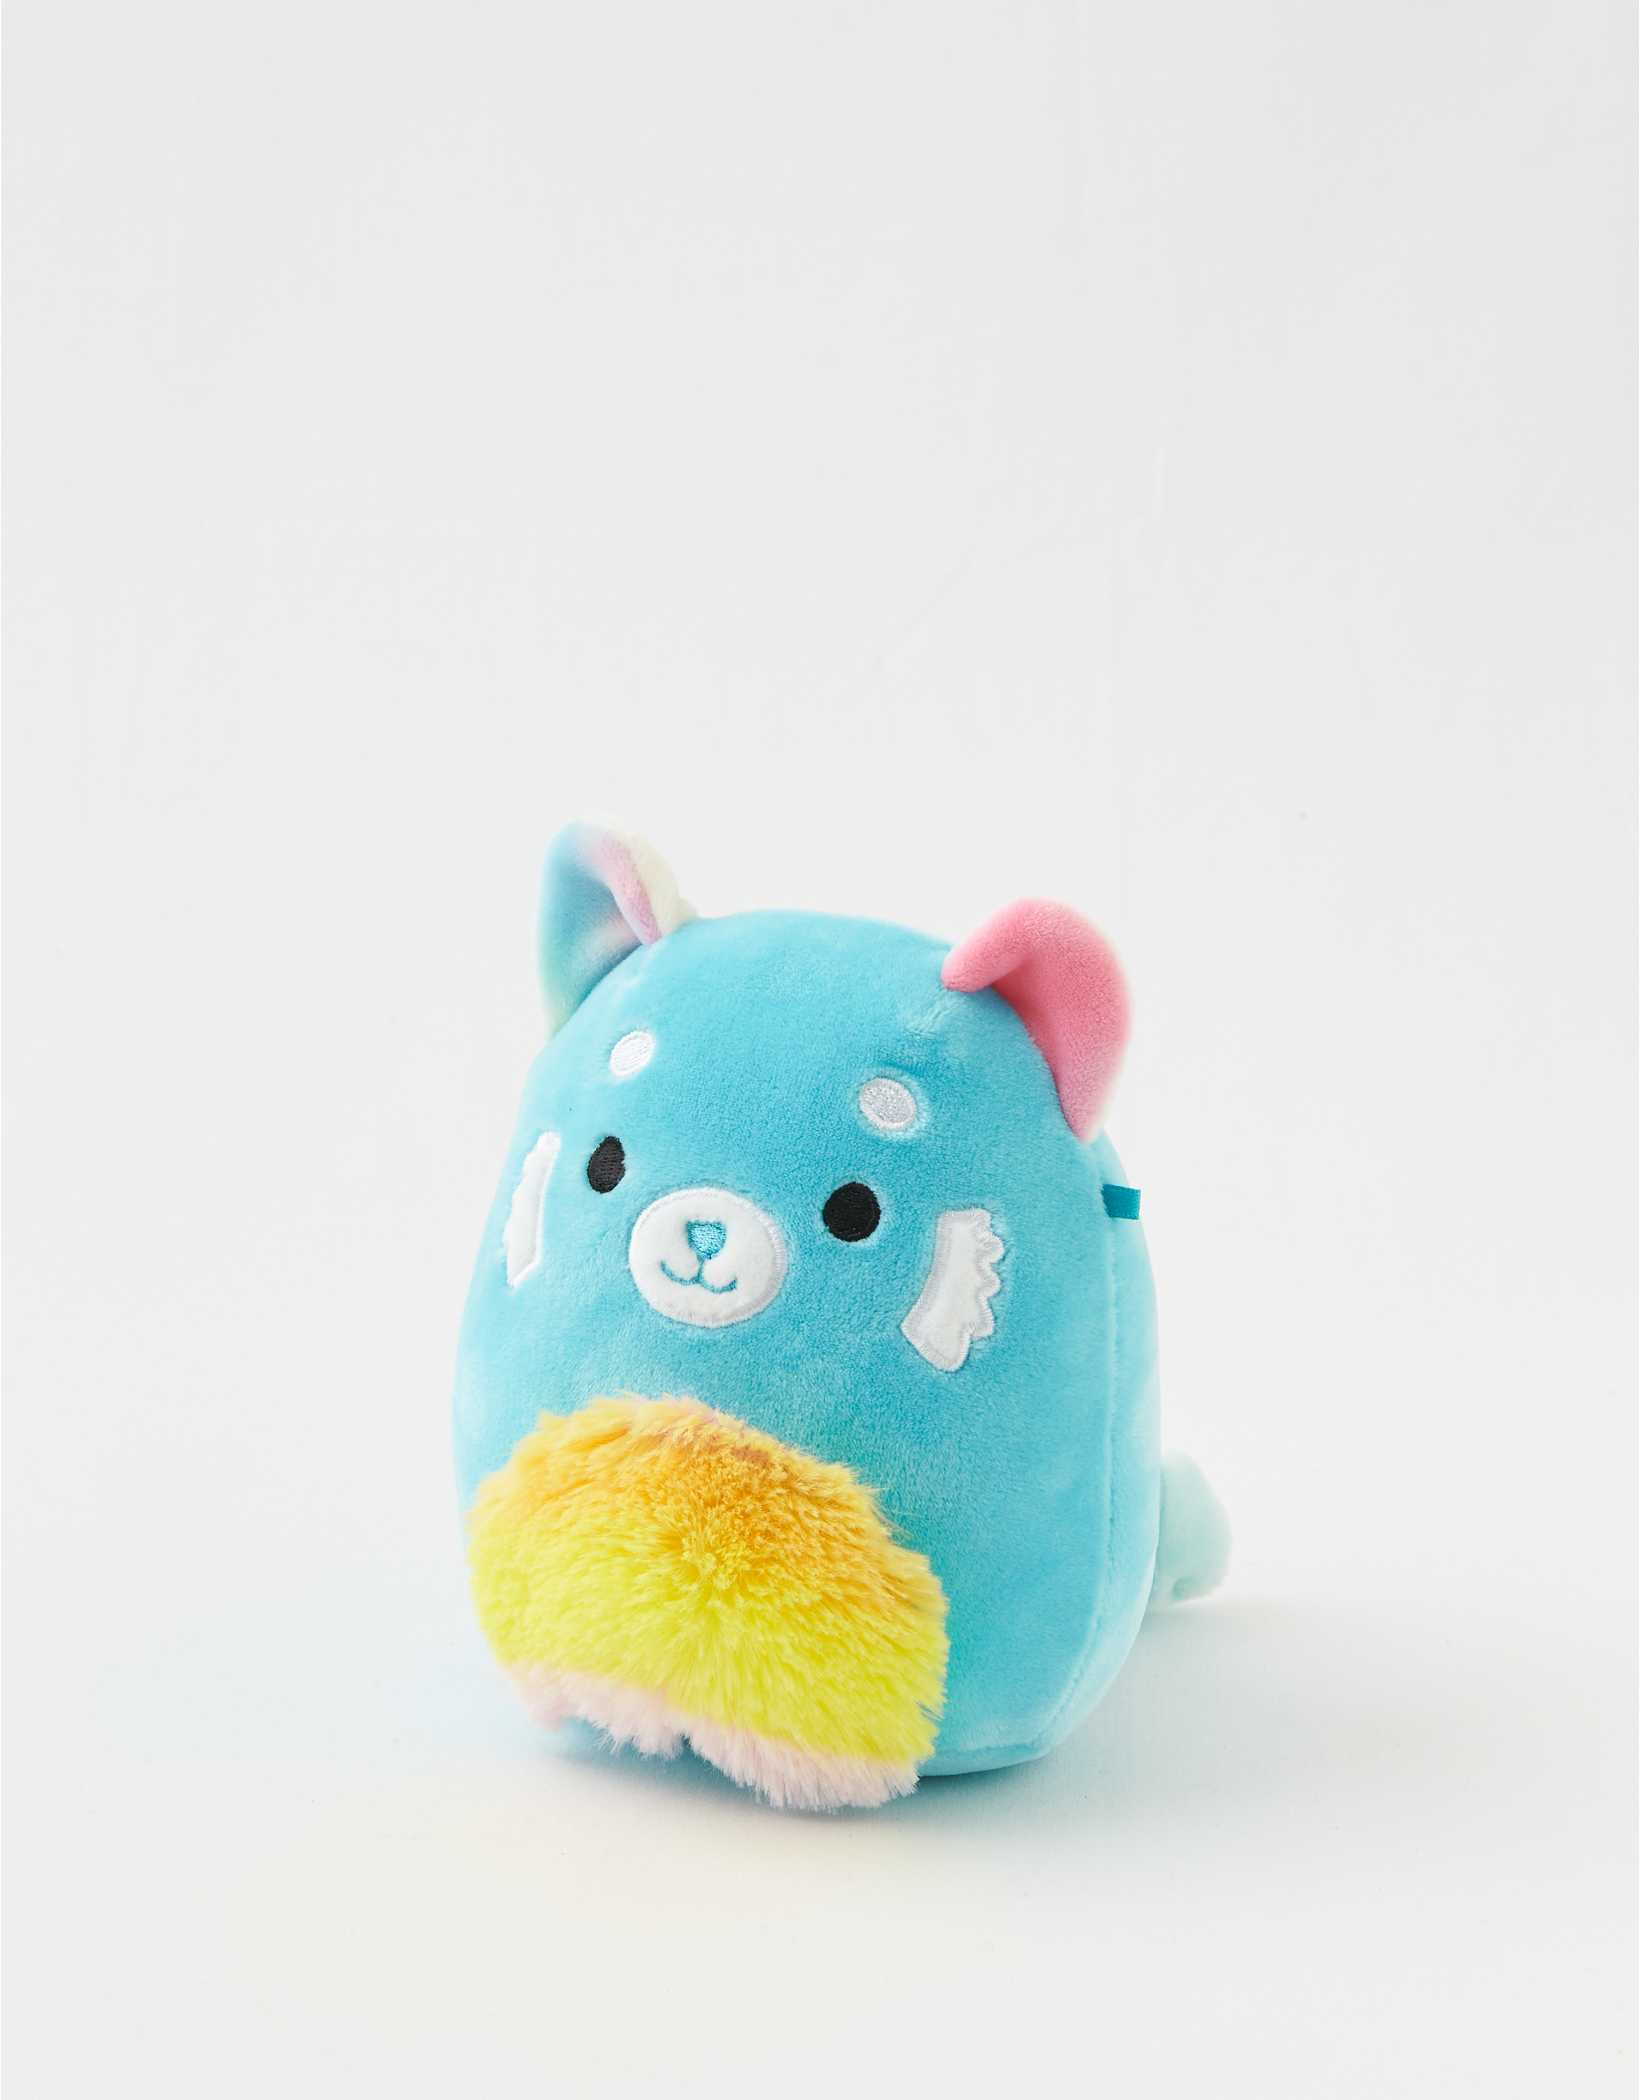 Squishmallow 5 in Plush Toy - Vanessa